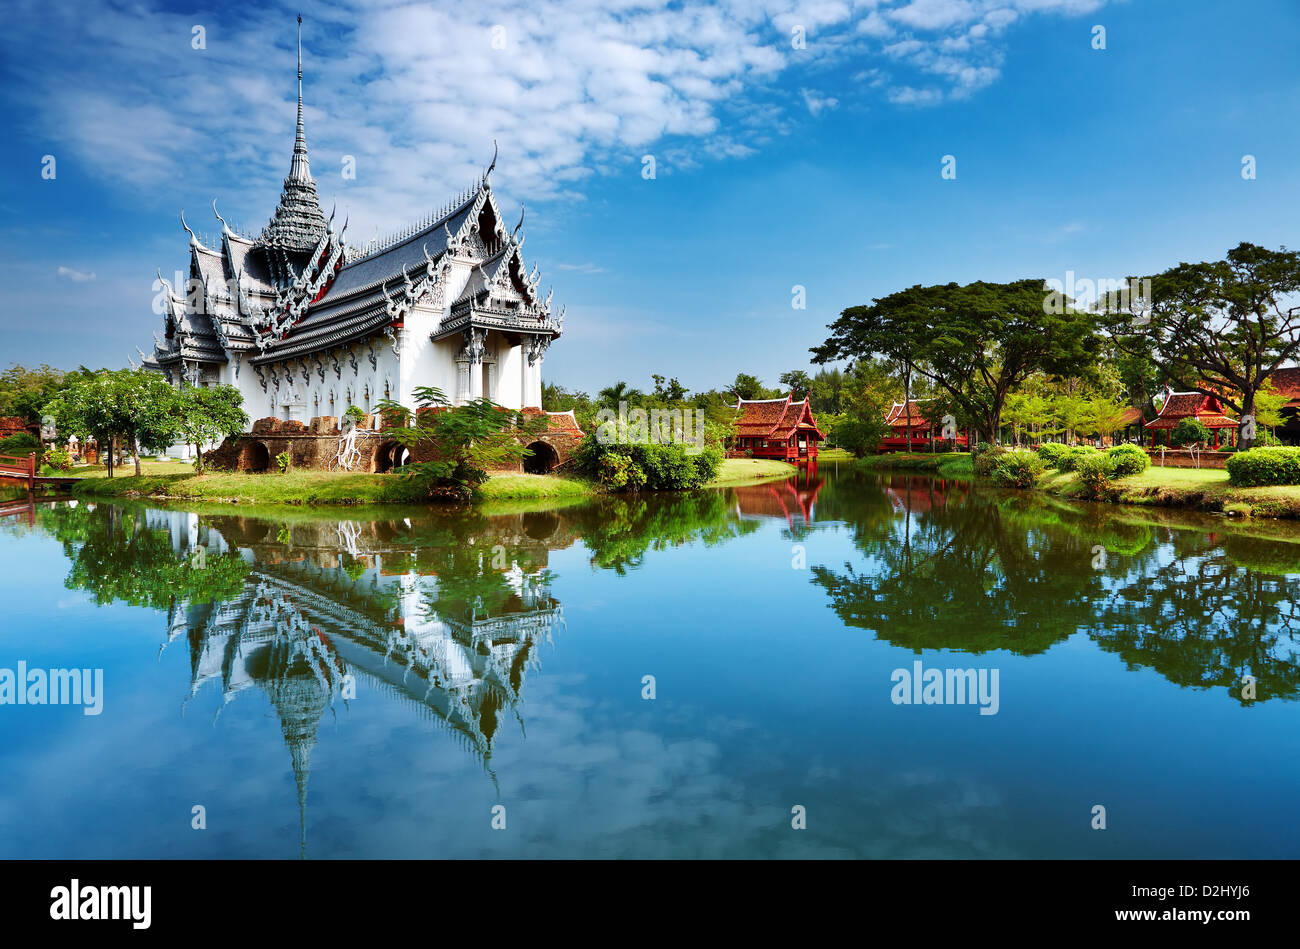 Sanphet Prasat Palace, antica città di Bangkok, Tailandia Immagini Stock